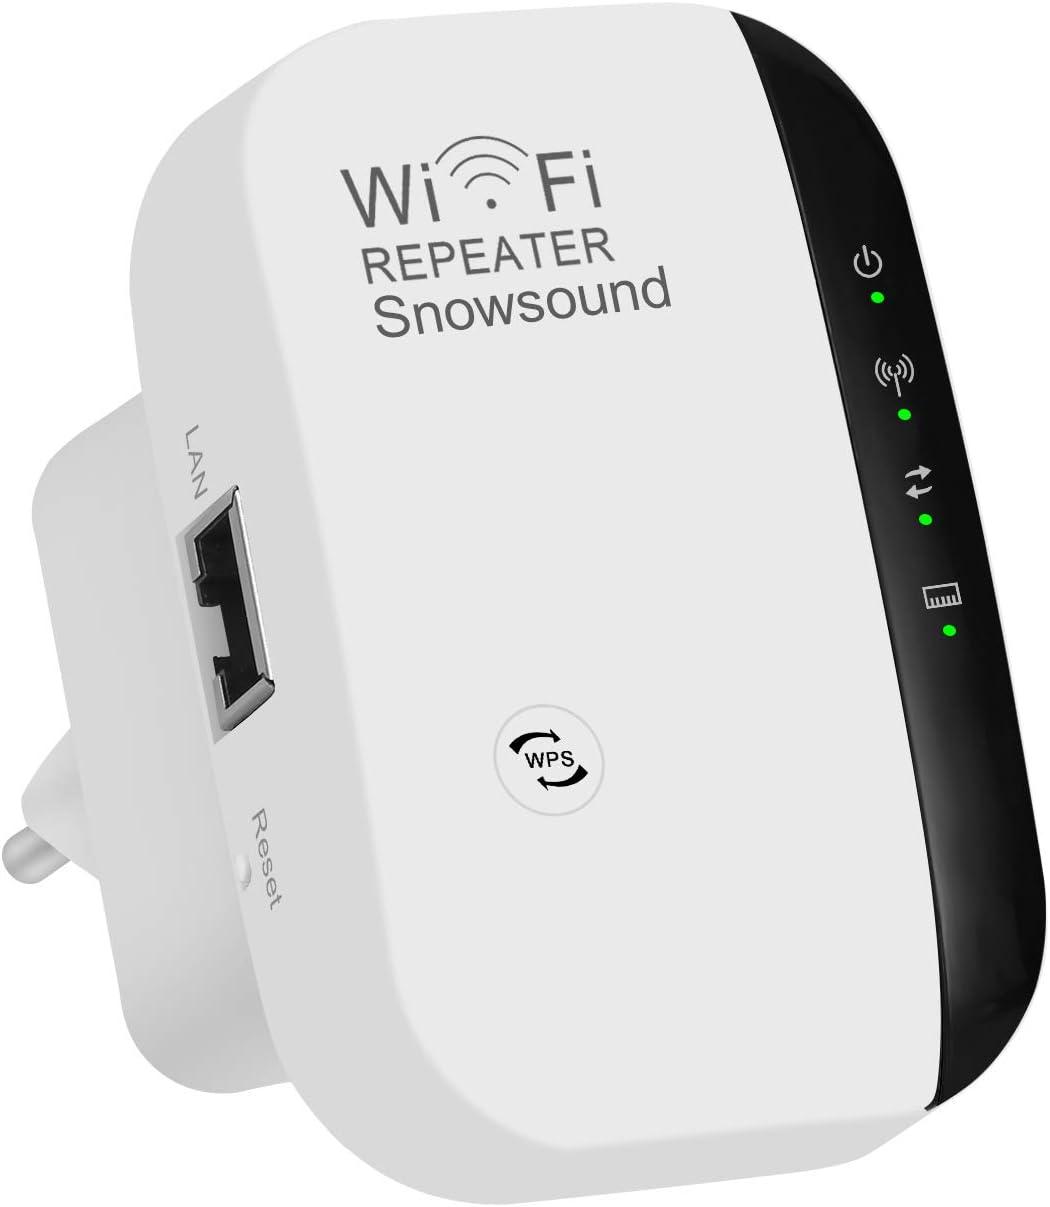 Amplificador WiFi Repetidor Extensor de alcance inalámbrico 300Mbps WiFi Signal Booster Red 2.4G con antenas integradas de puerto LAN Admite el modo ...